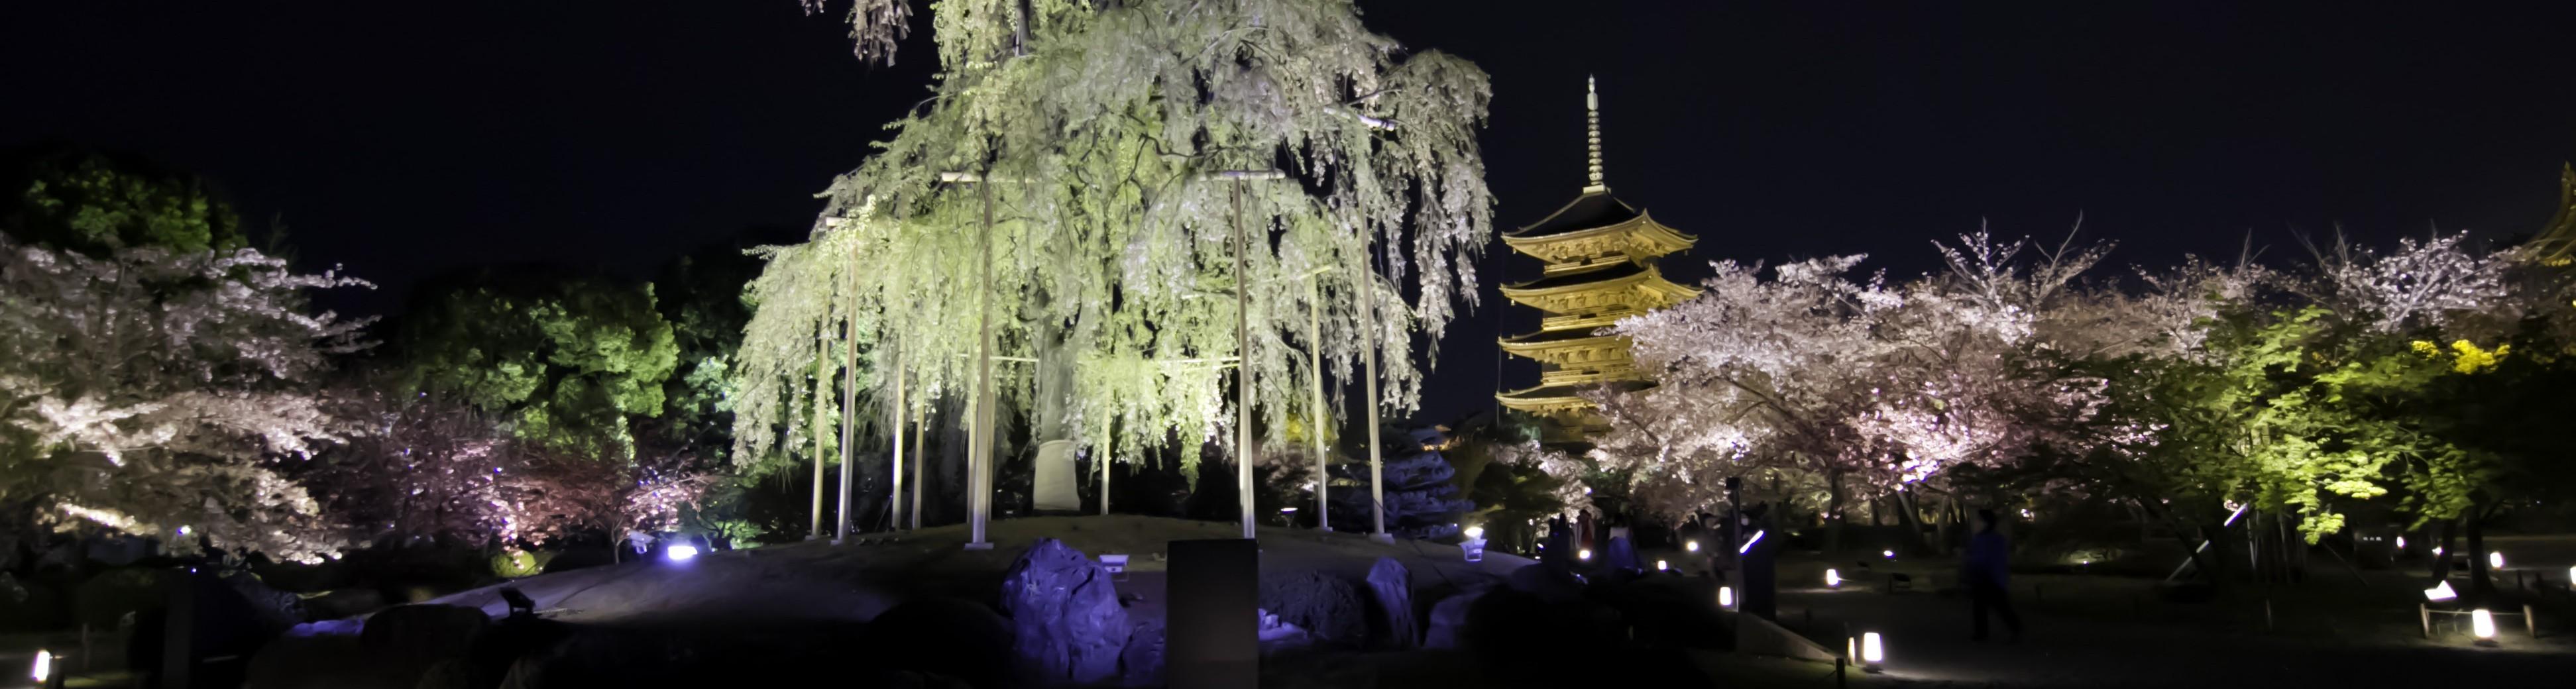 DFS Photography Japan